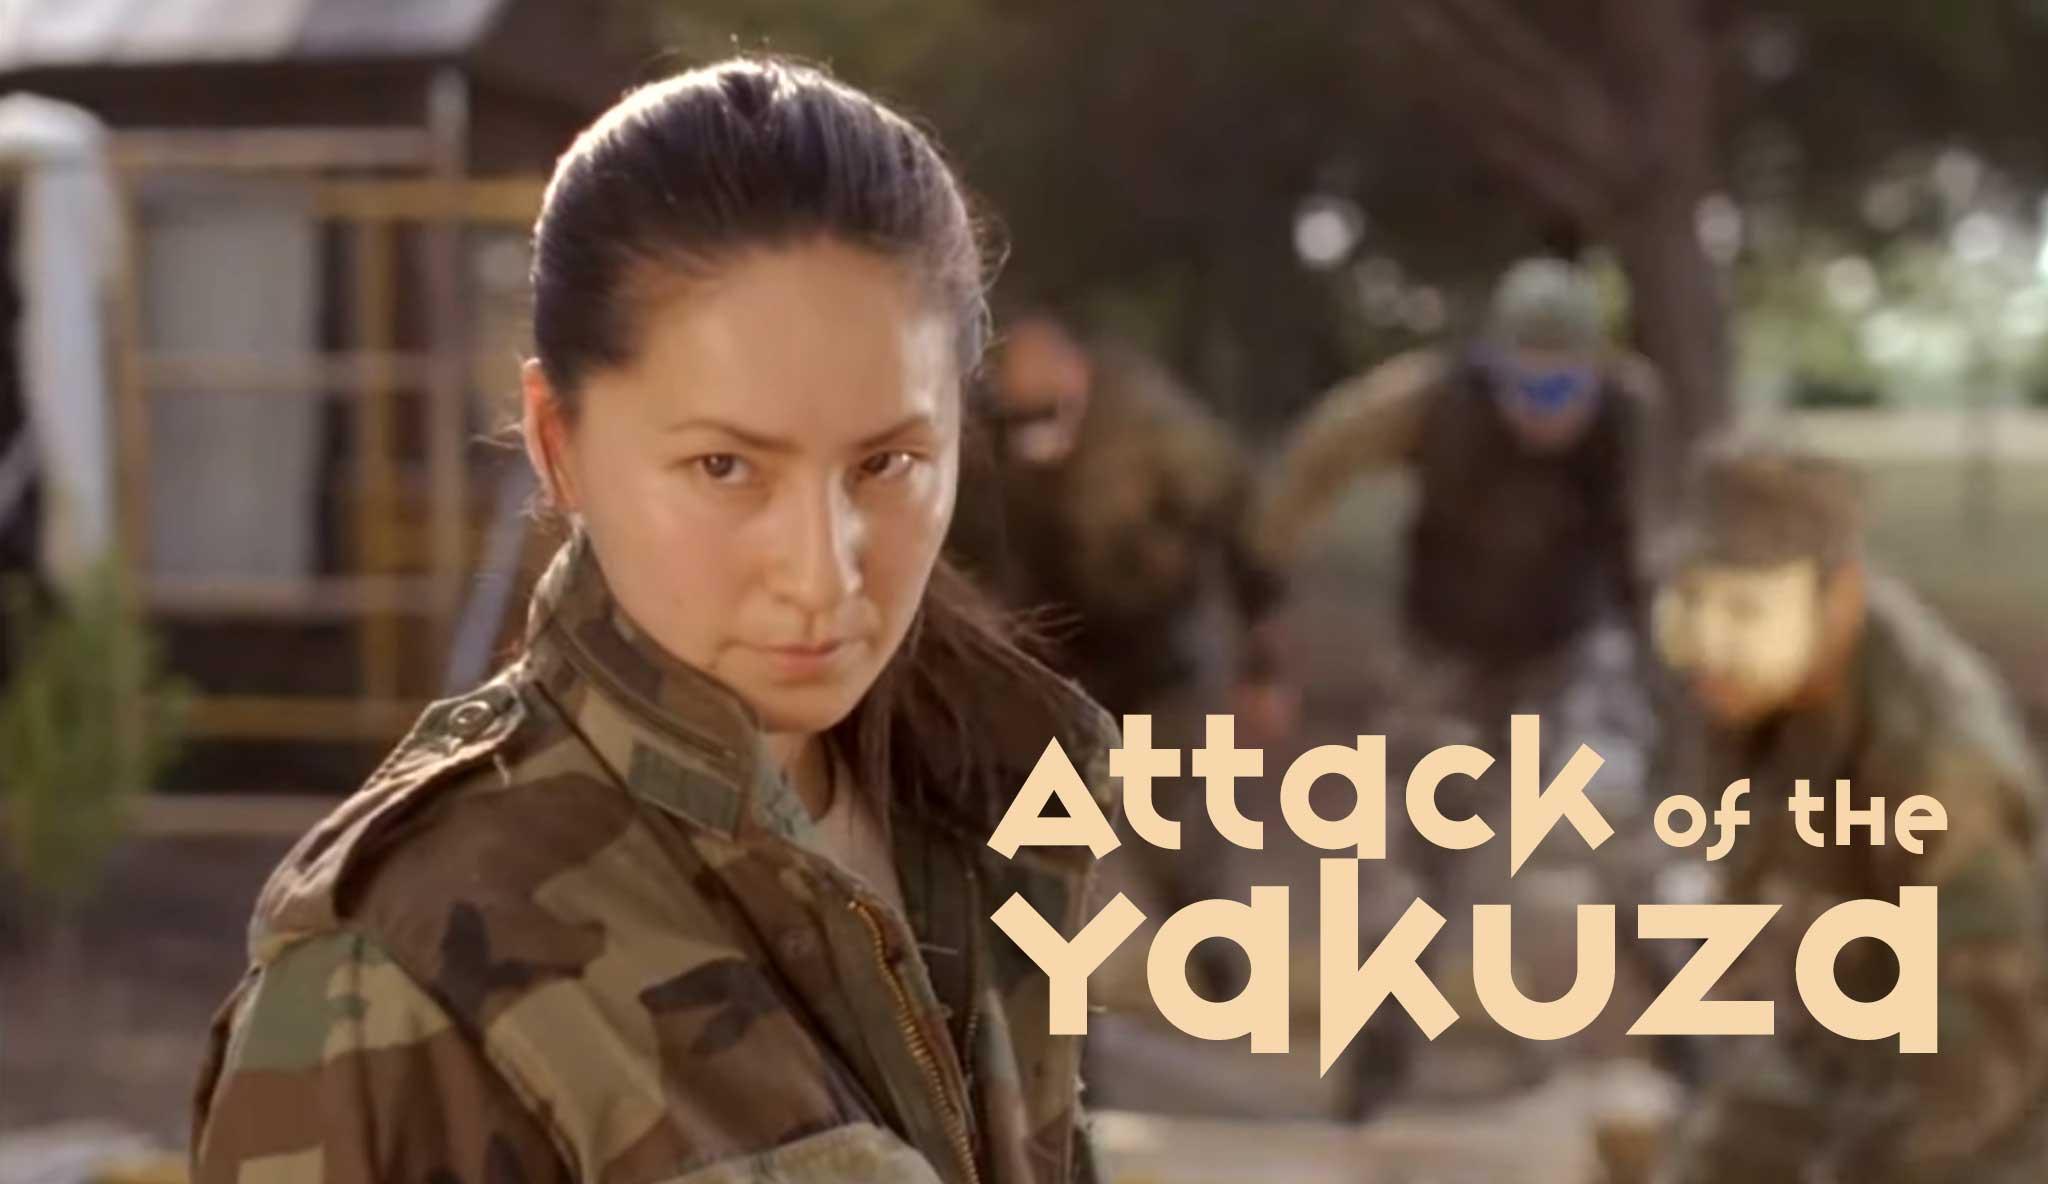 attack-of-the-yakuza-broken-path\header.jpg